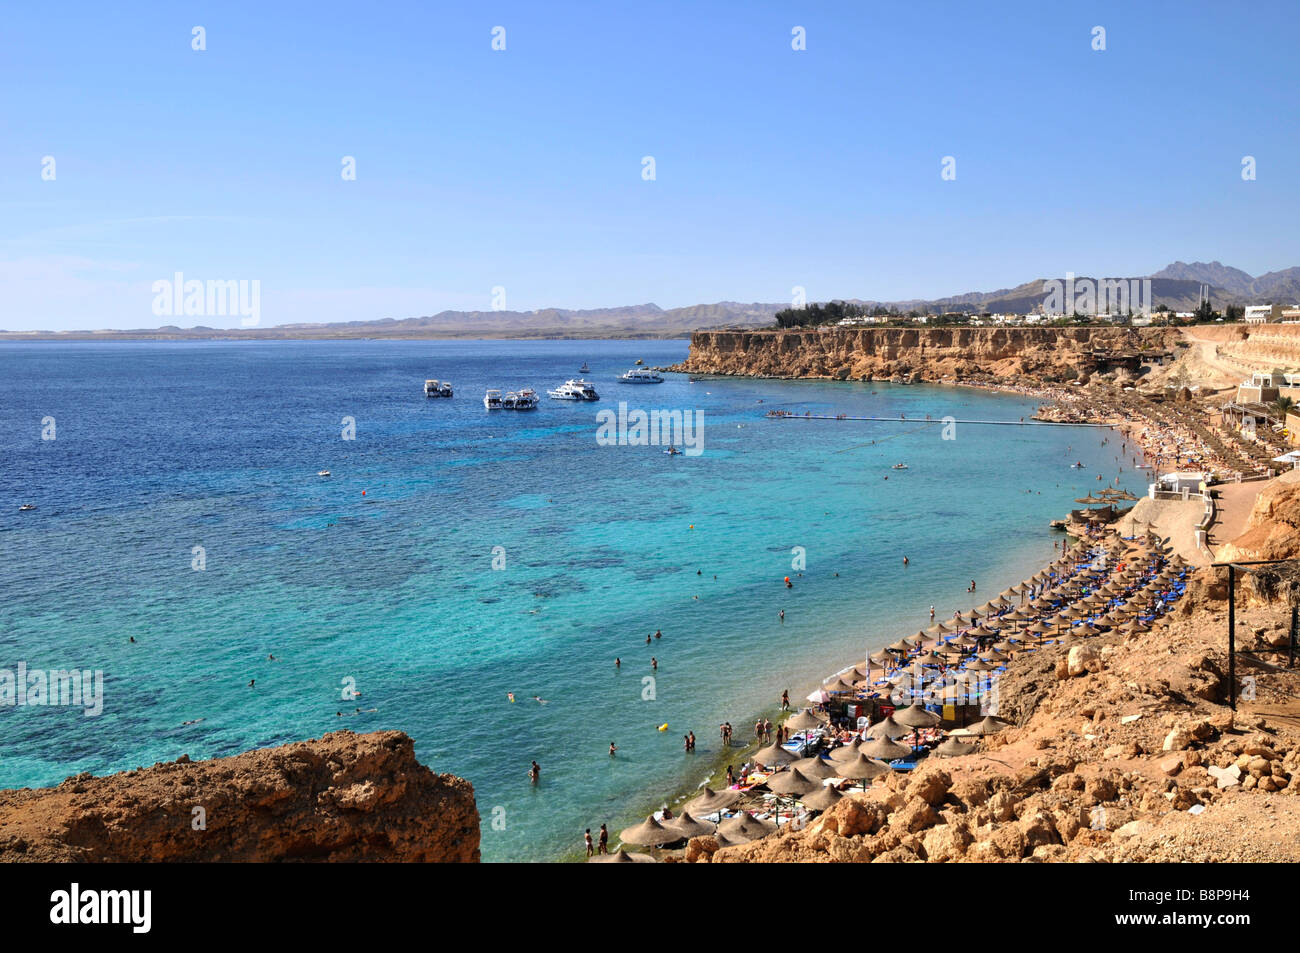 Naama bay in sharm el sheikh